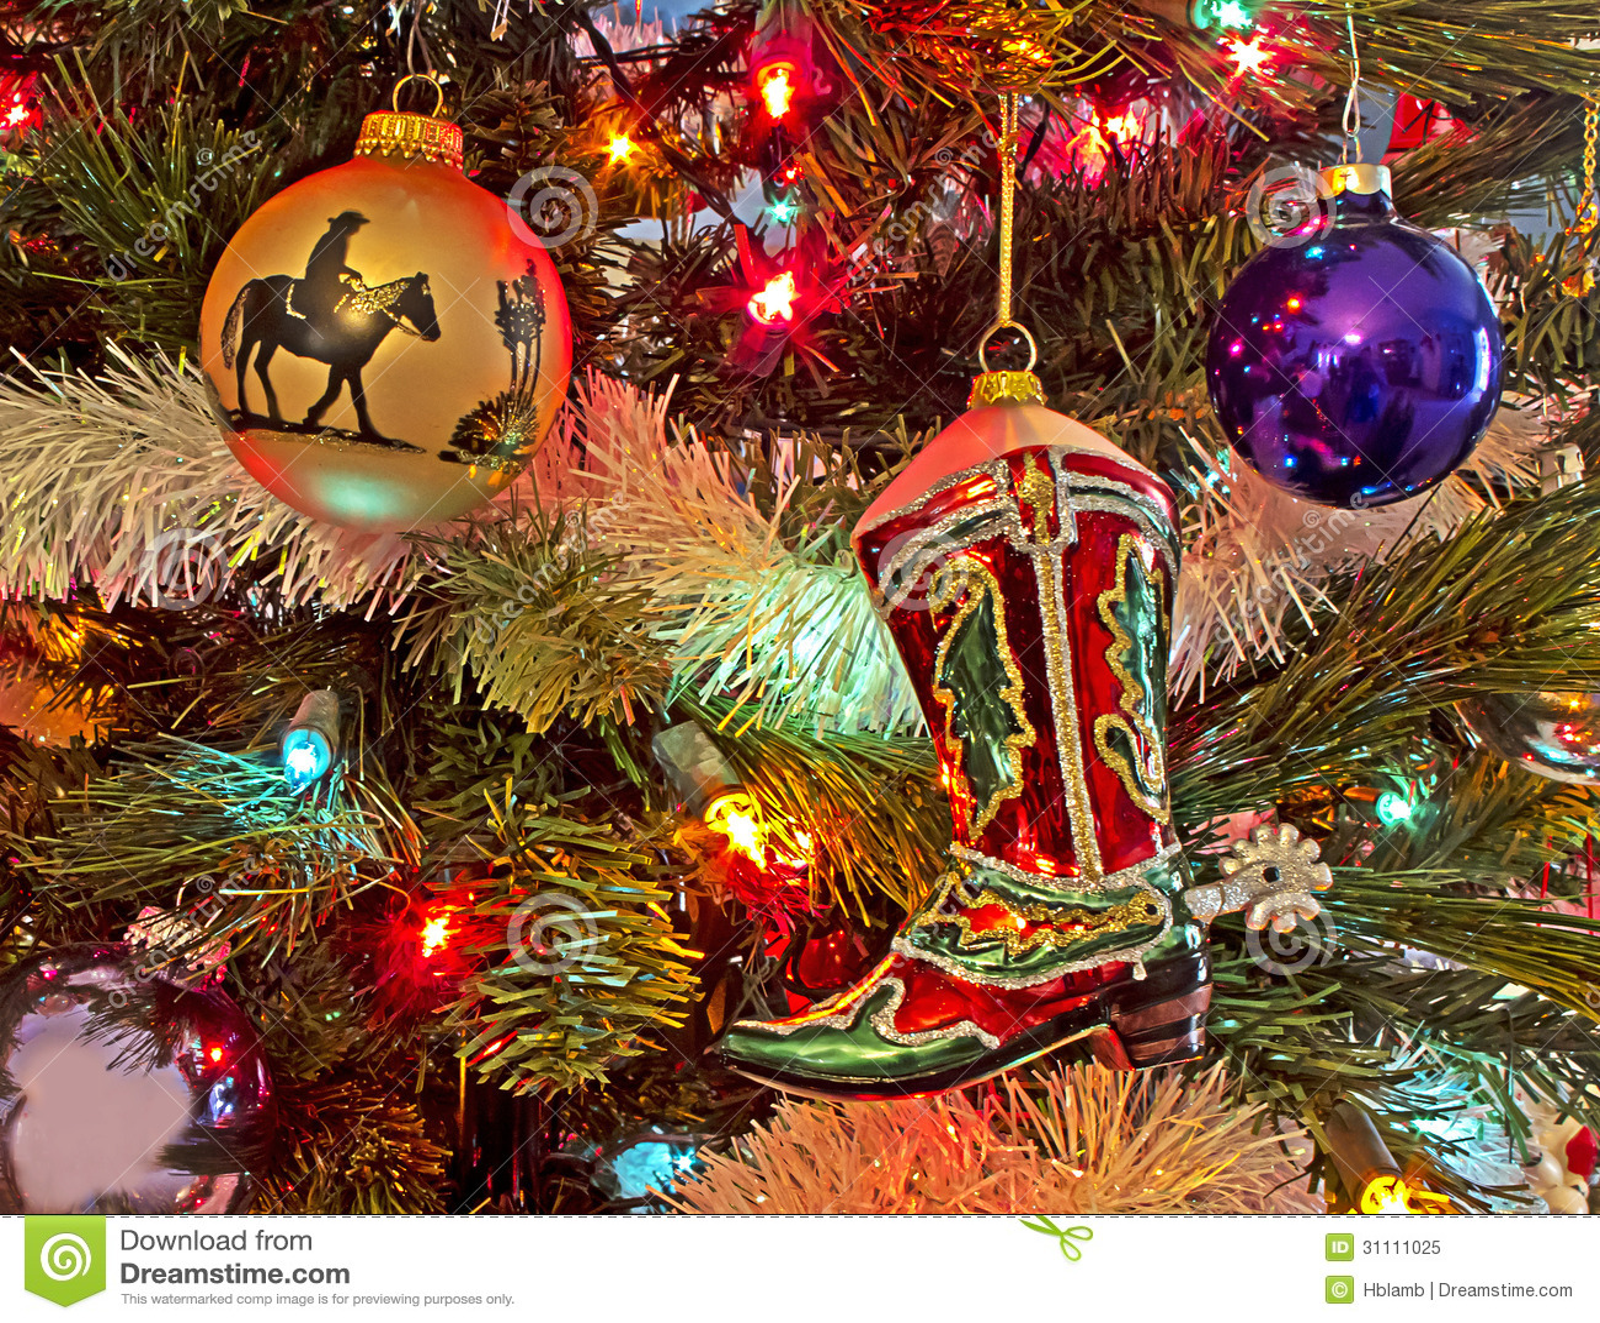 Cowboy Christmas Royalty Free Stock Photo - Image: 31111025